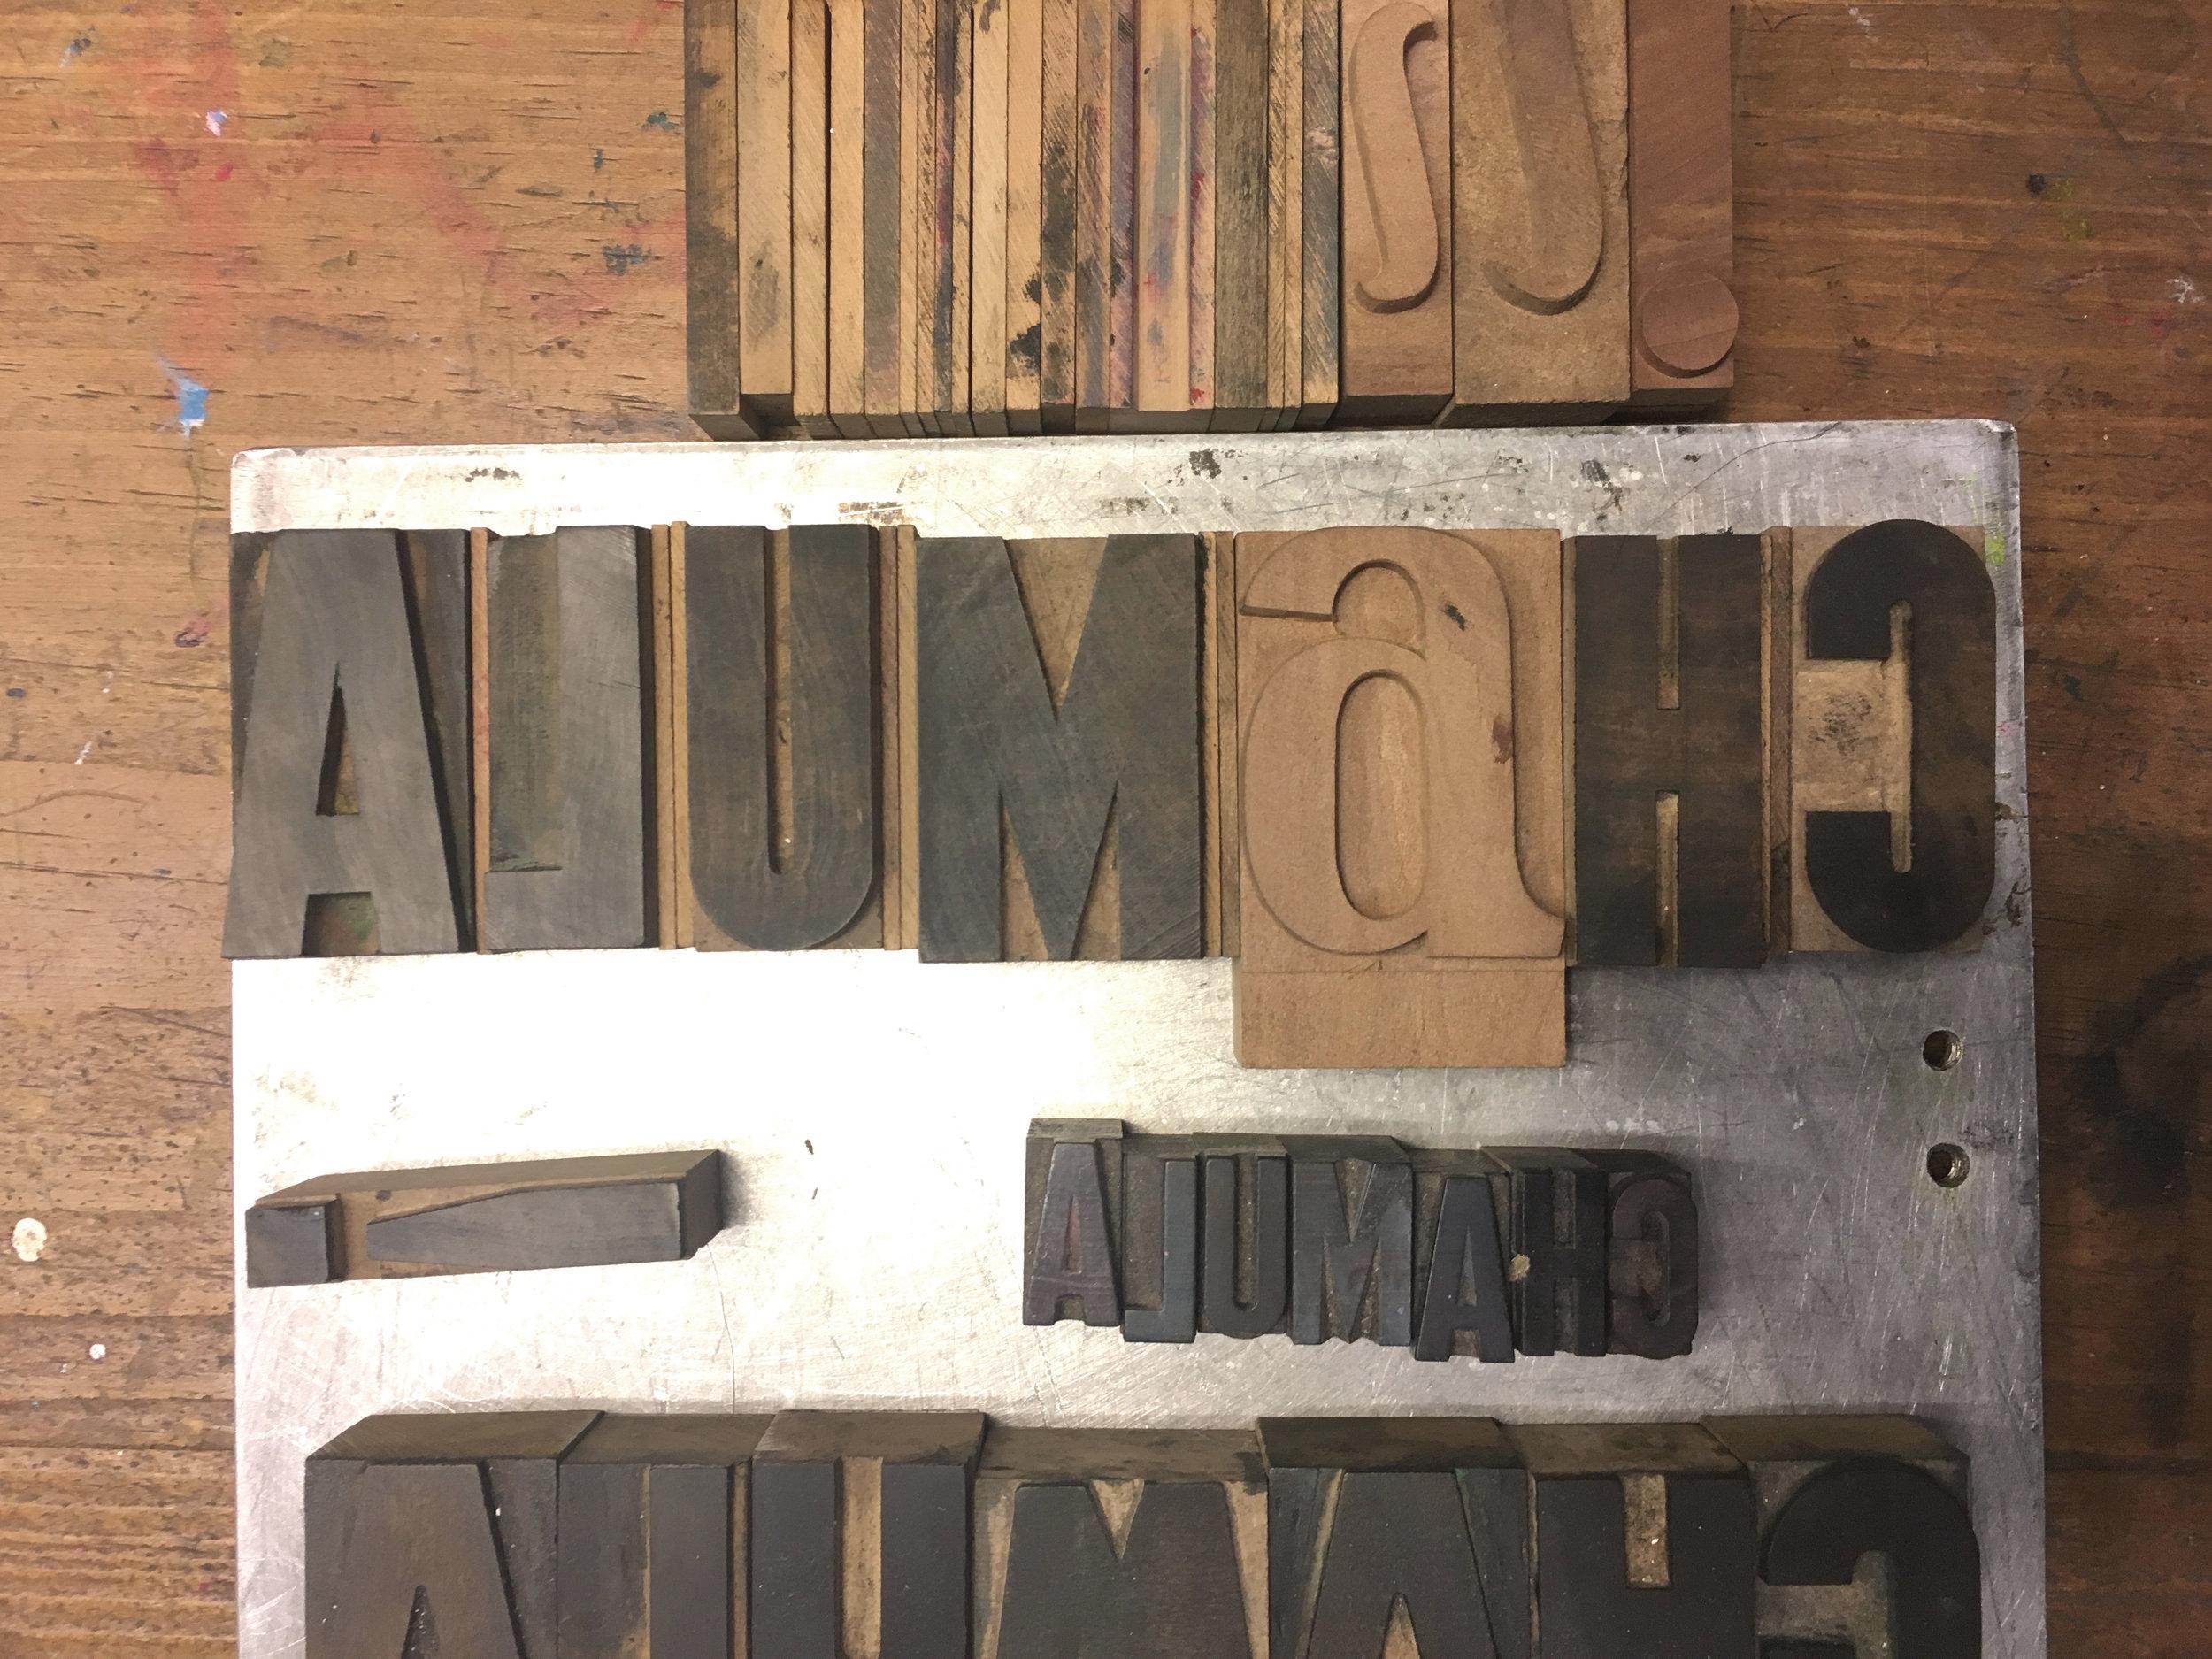 12-personalpress-taller-papel-principal-letterpress-imprenta-tipografica-1.jpg